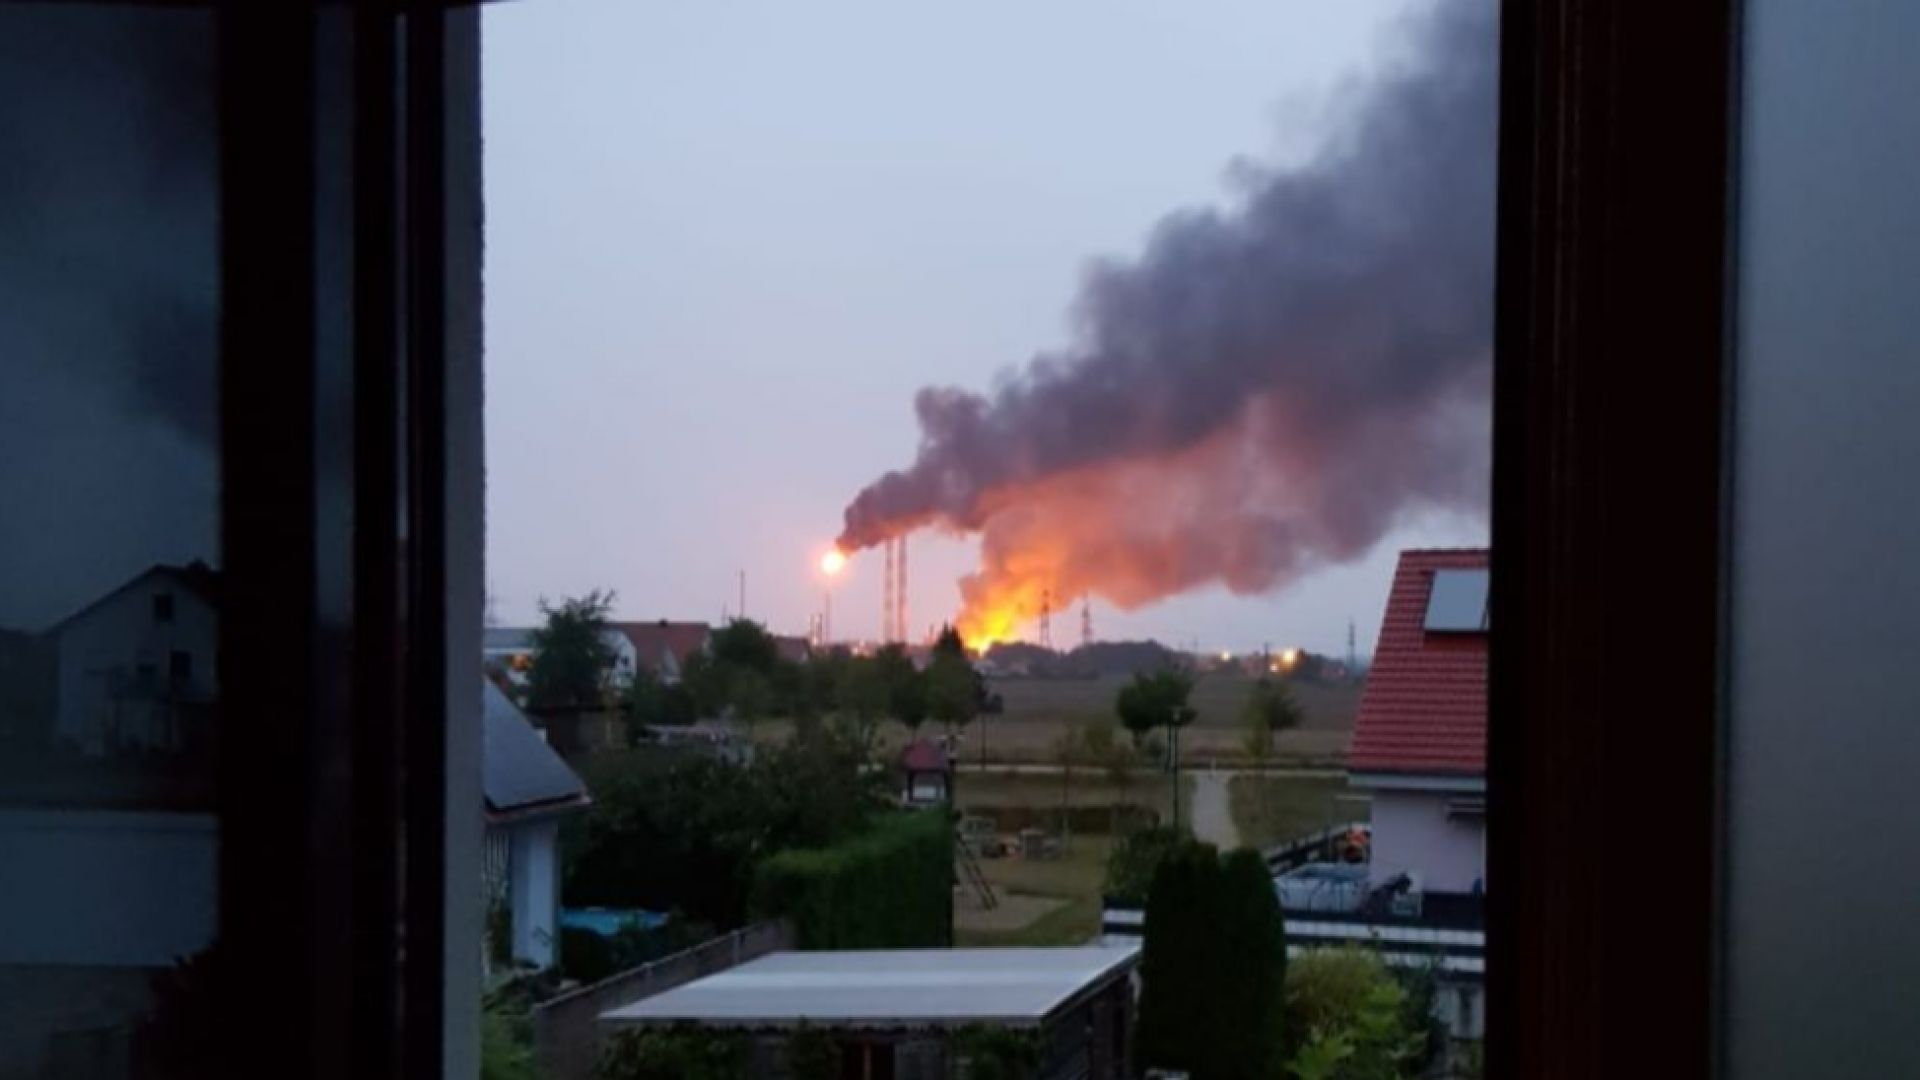 Експлозия в рафинерия край южногерманския град Инголщат, има ранени